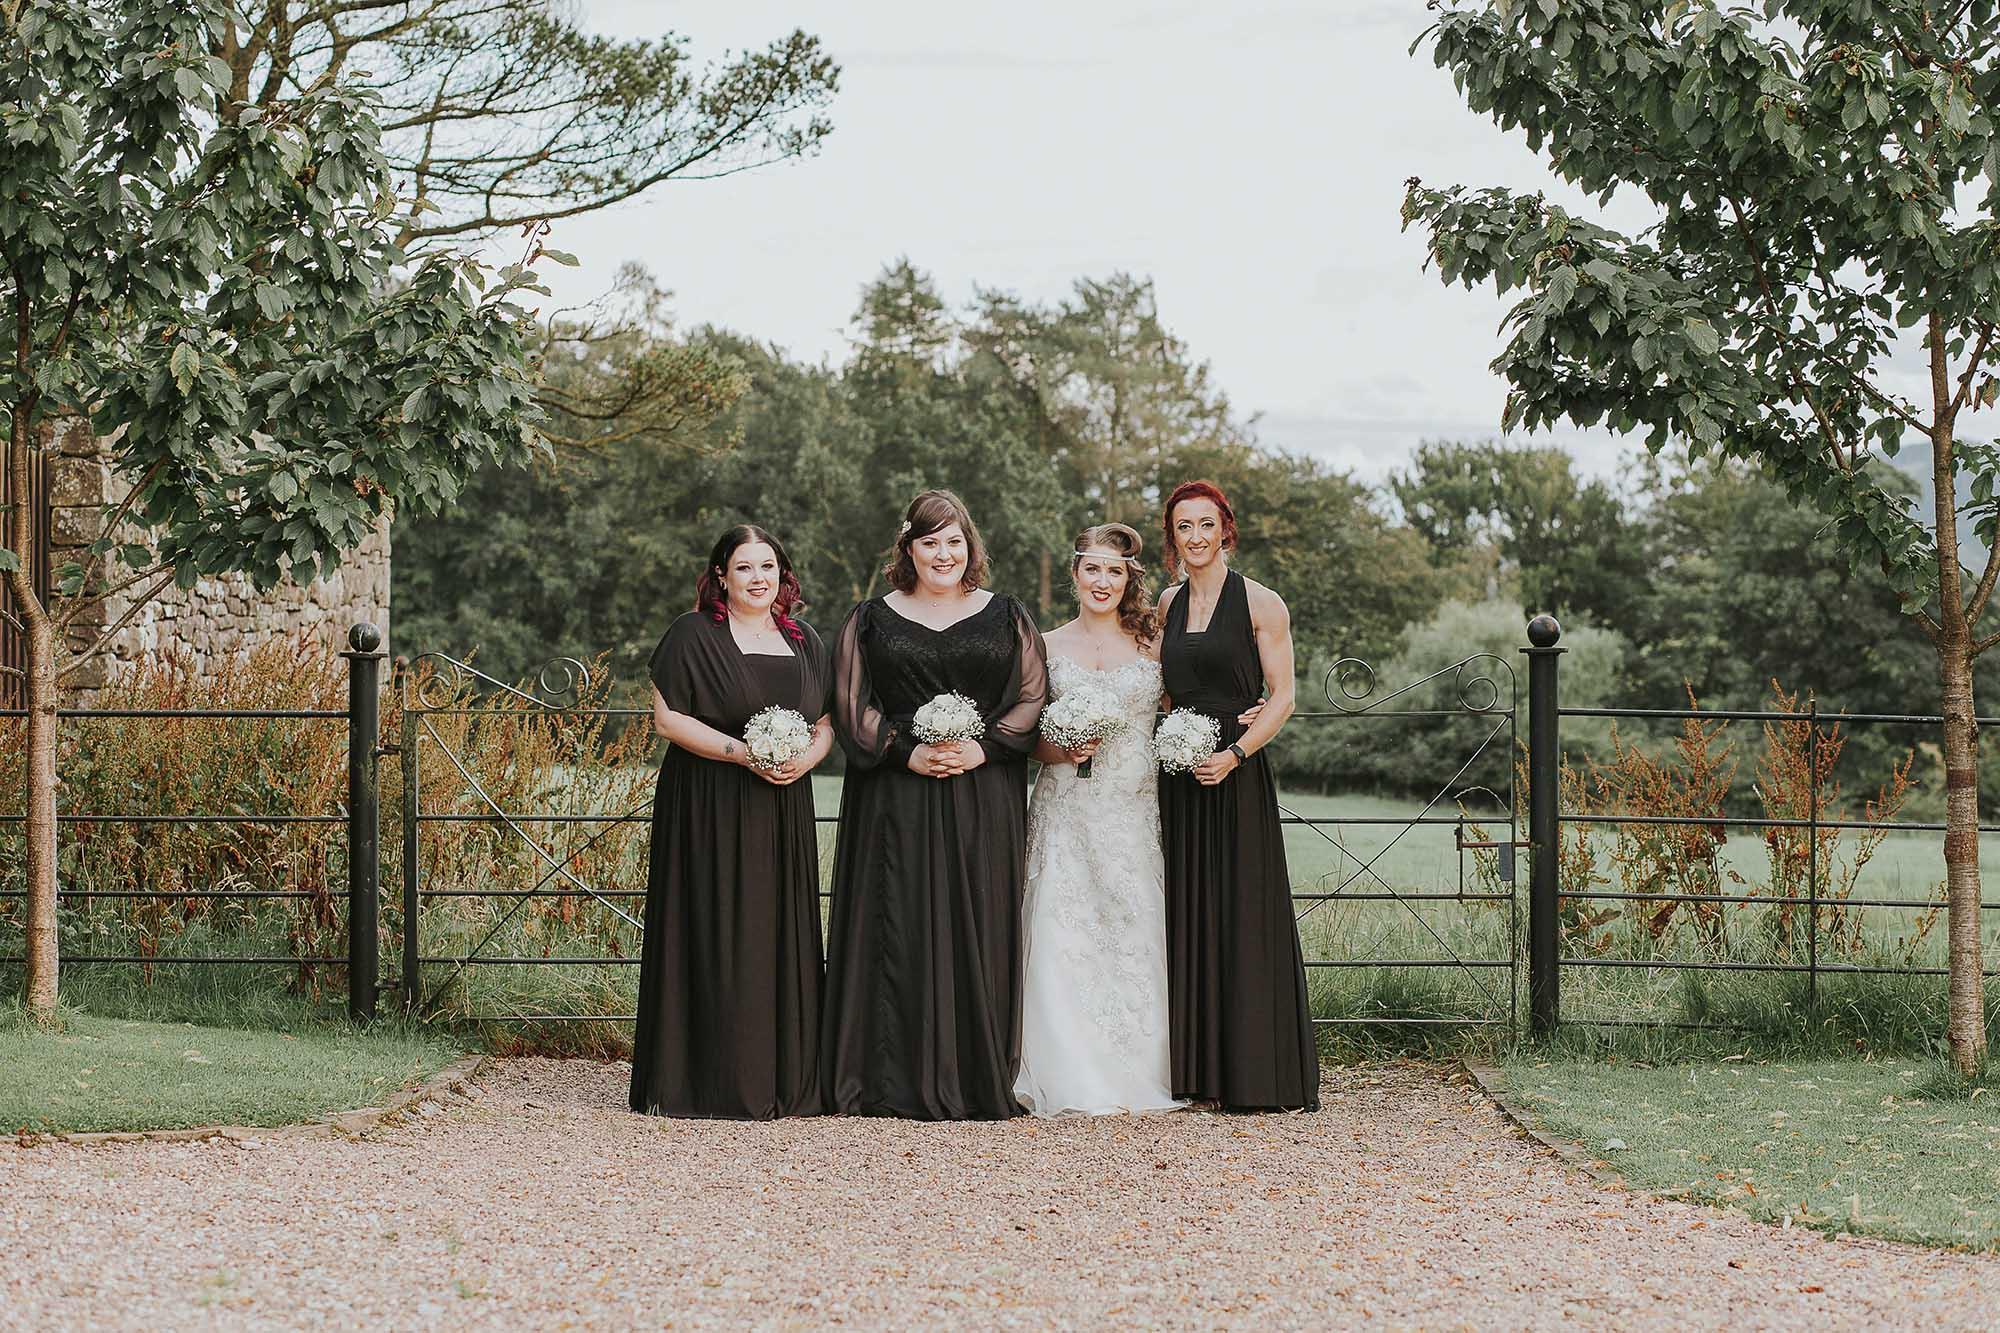 Eliza and Ethan bridesmaid dresses